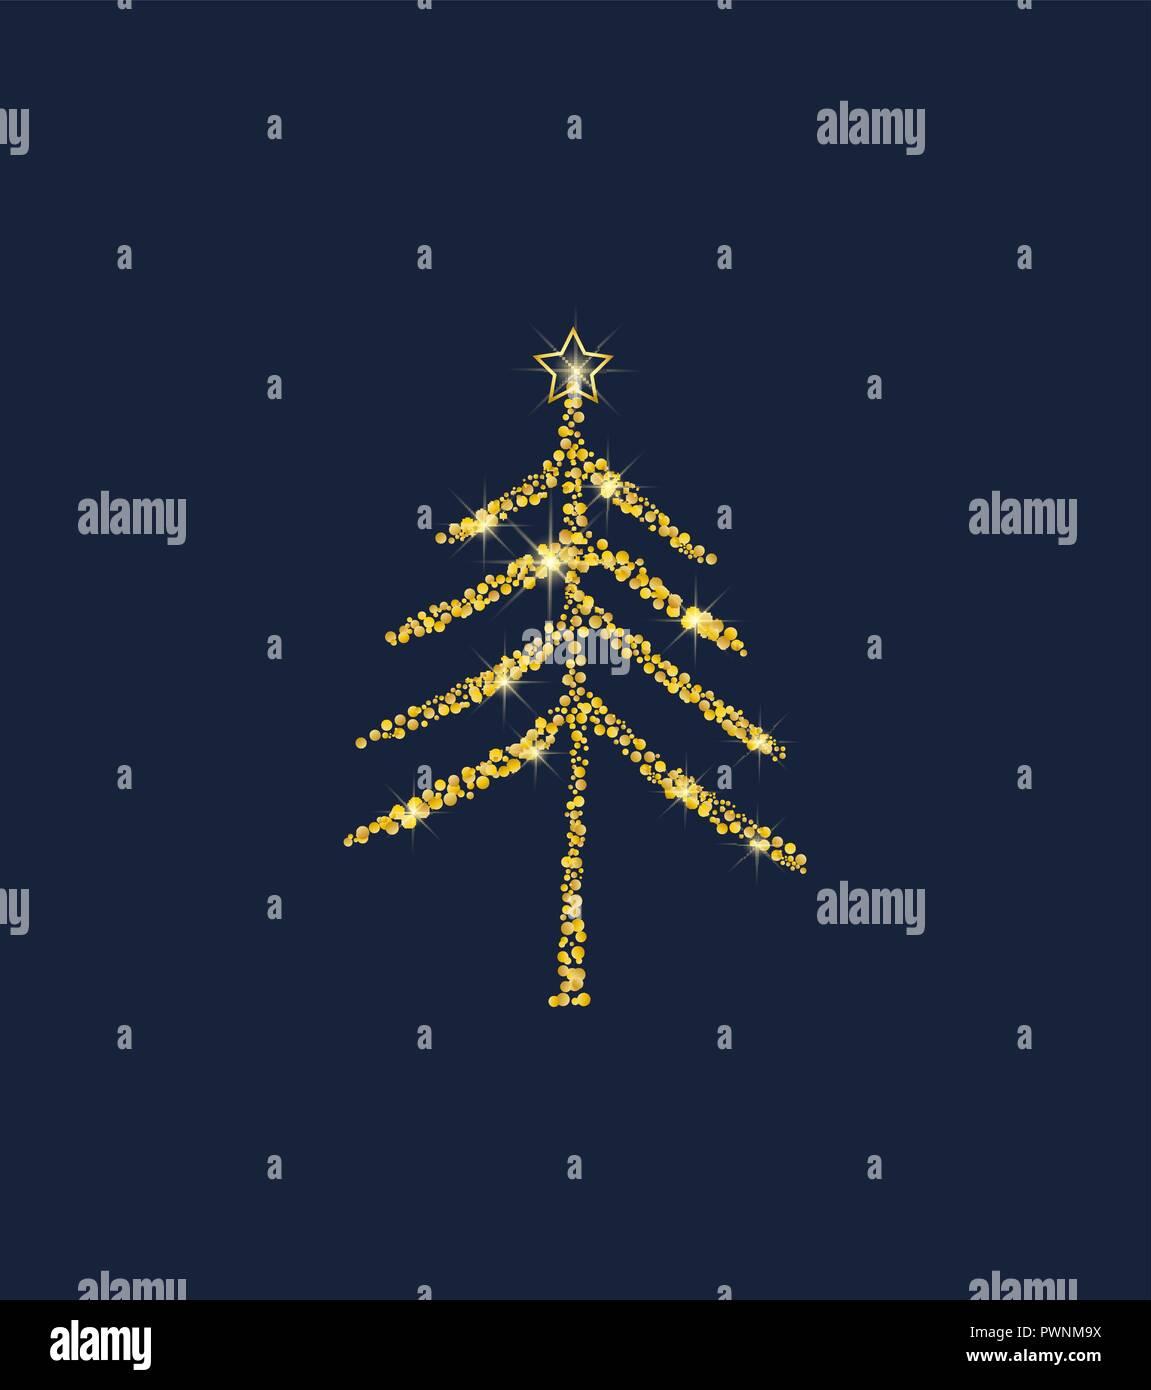 Golden Christmas Tree Stock Vector Art Illustration Vector Image